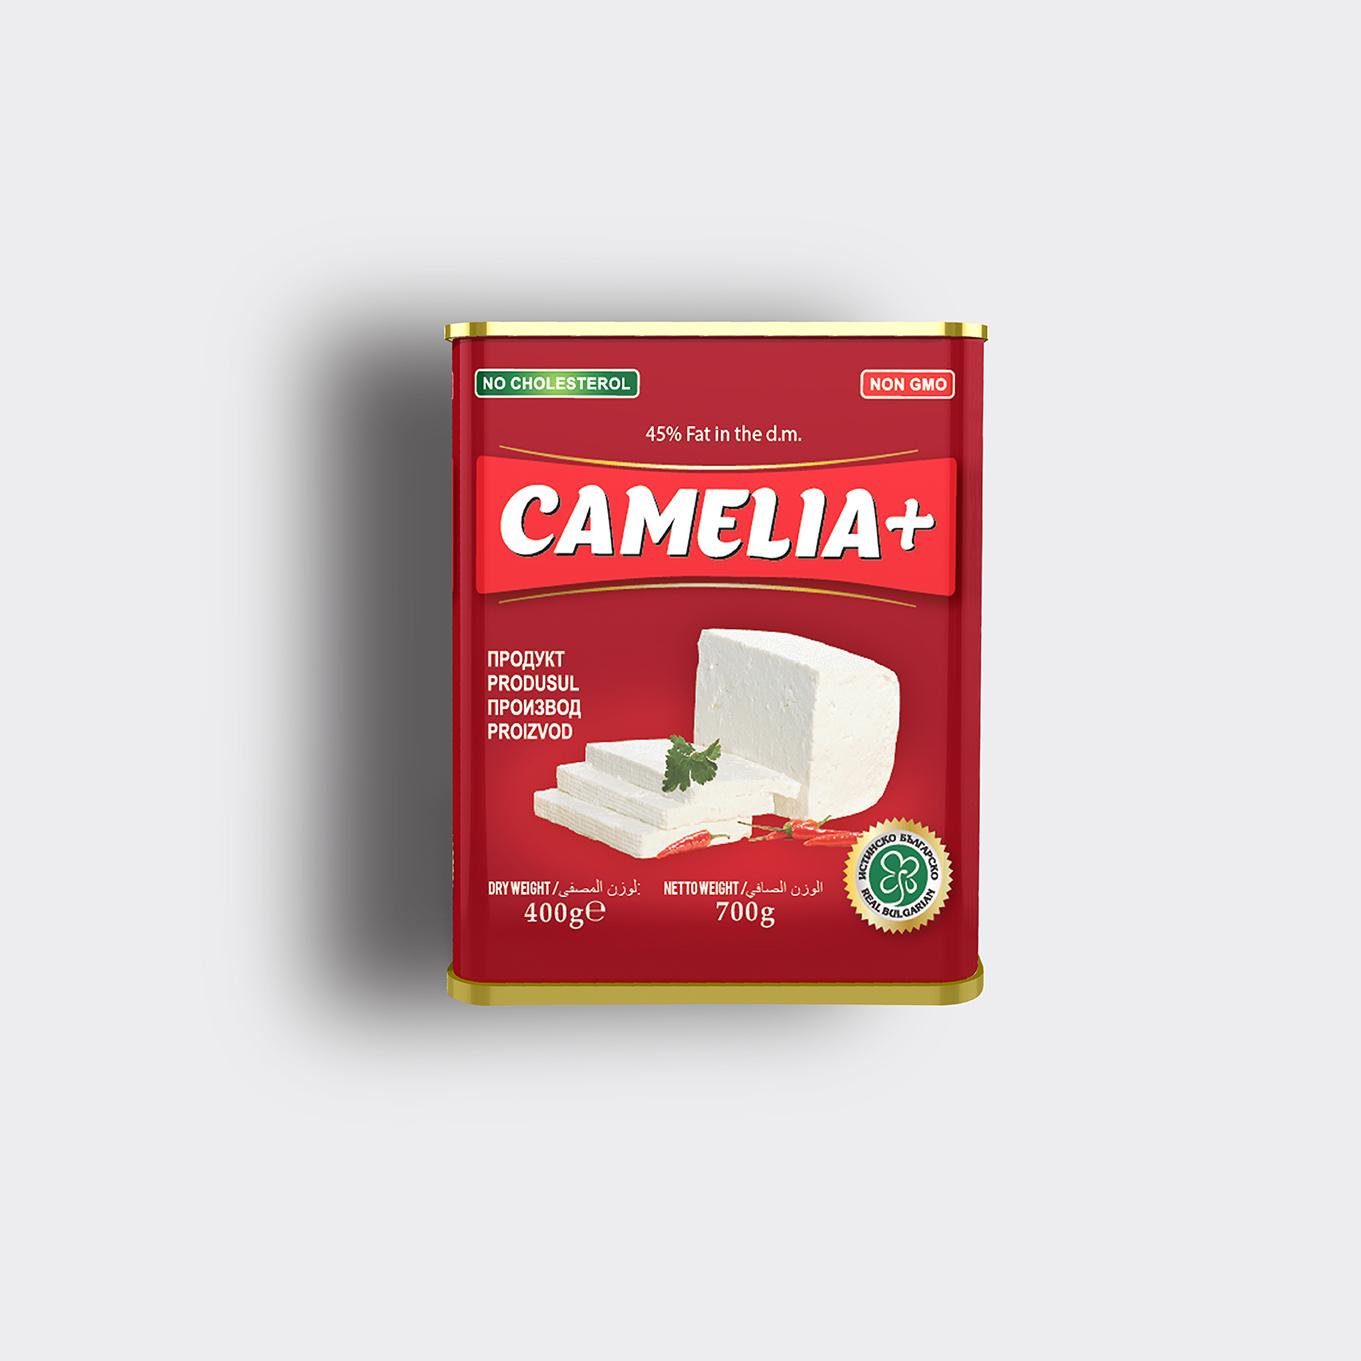 camelia-peynir-teneke-kutu-tasarimi